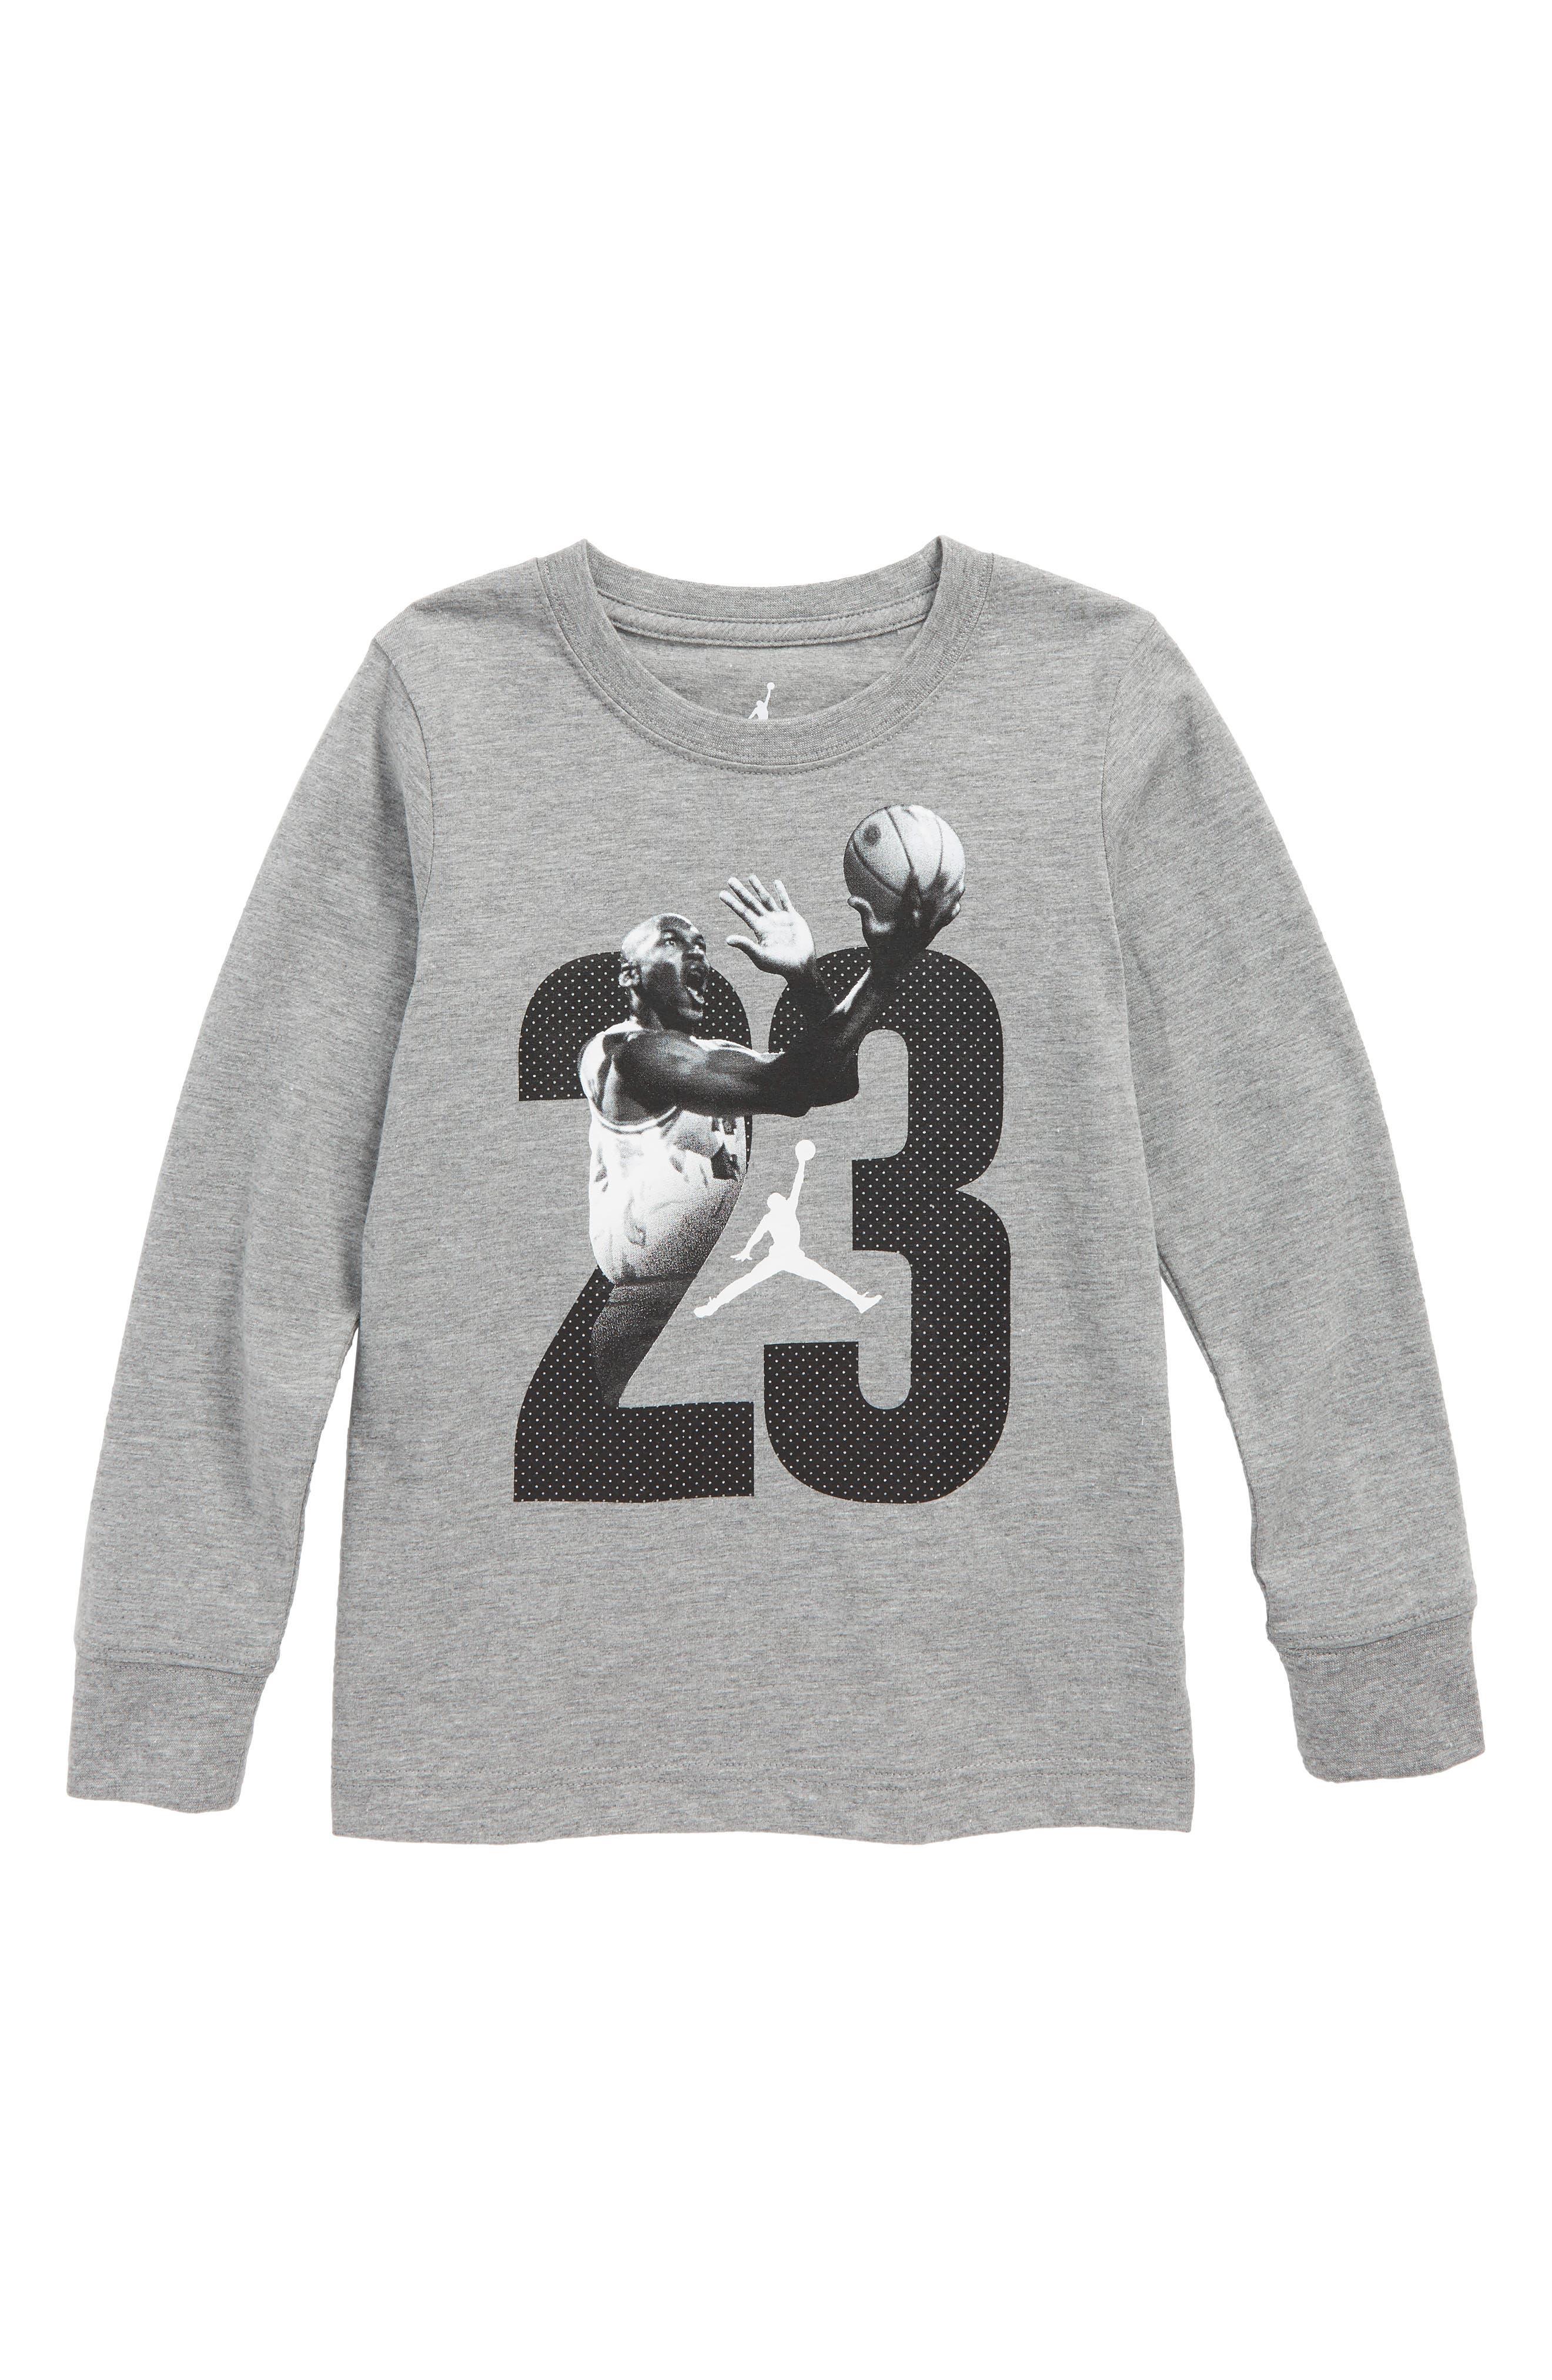 Jordan 23 Graphic Long Sleeve T-Shirt,                             Main thumbnail 1, color,